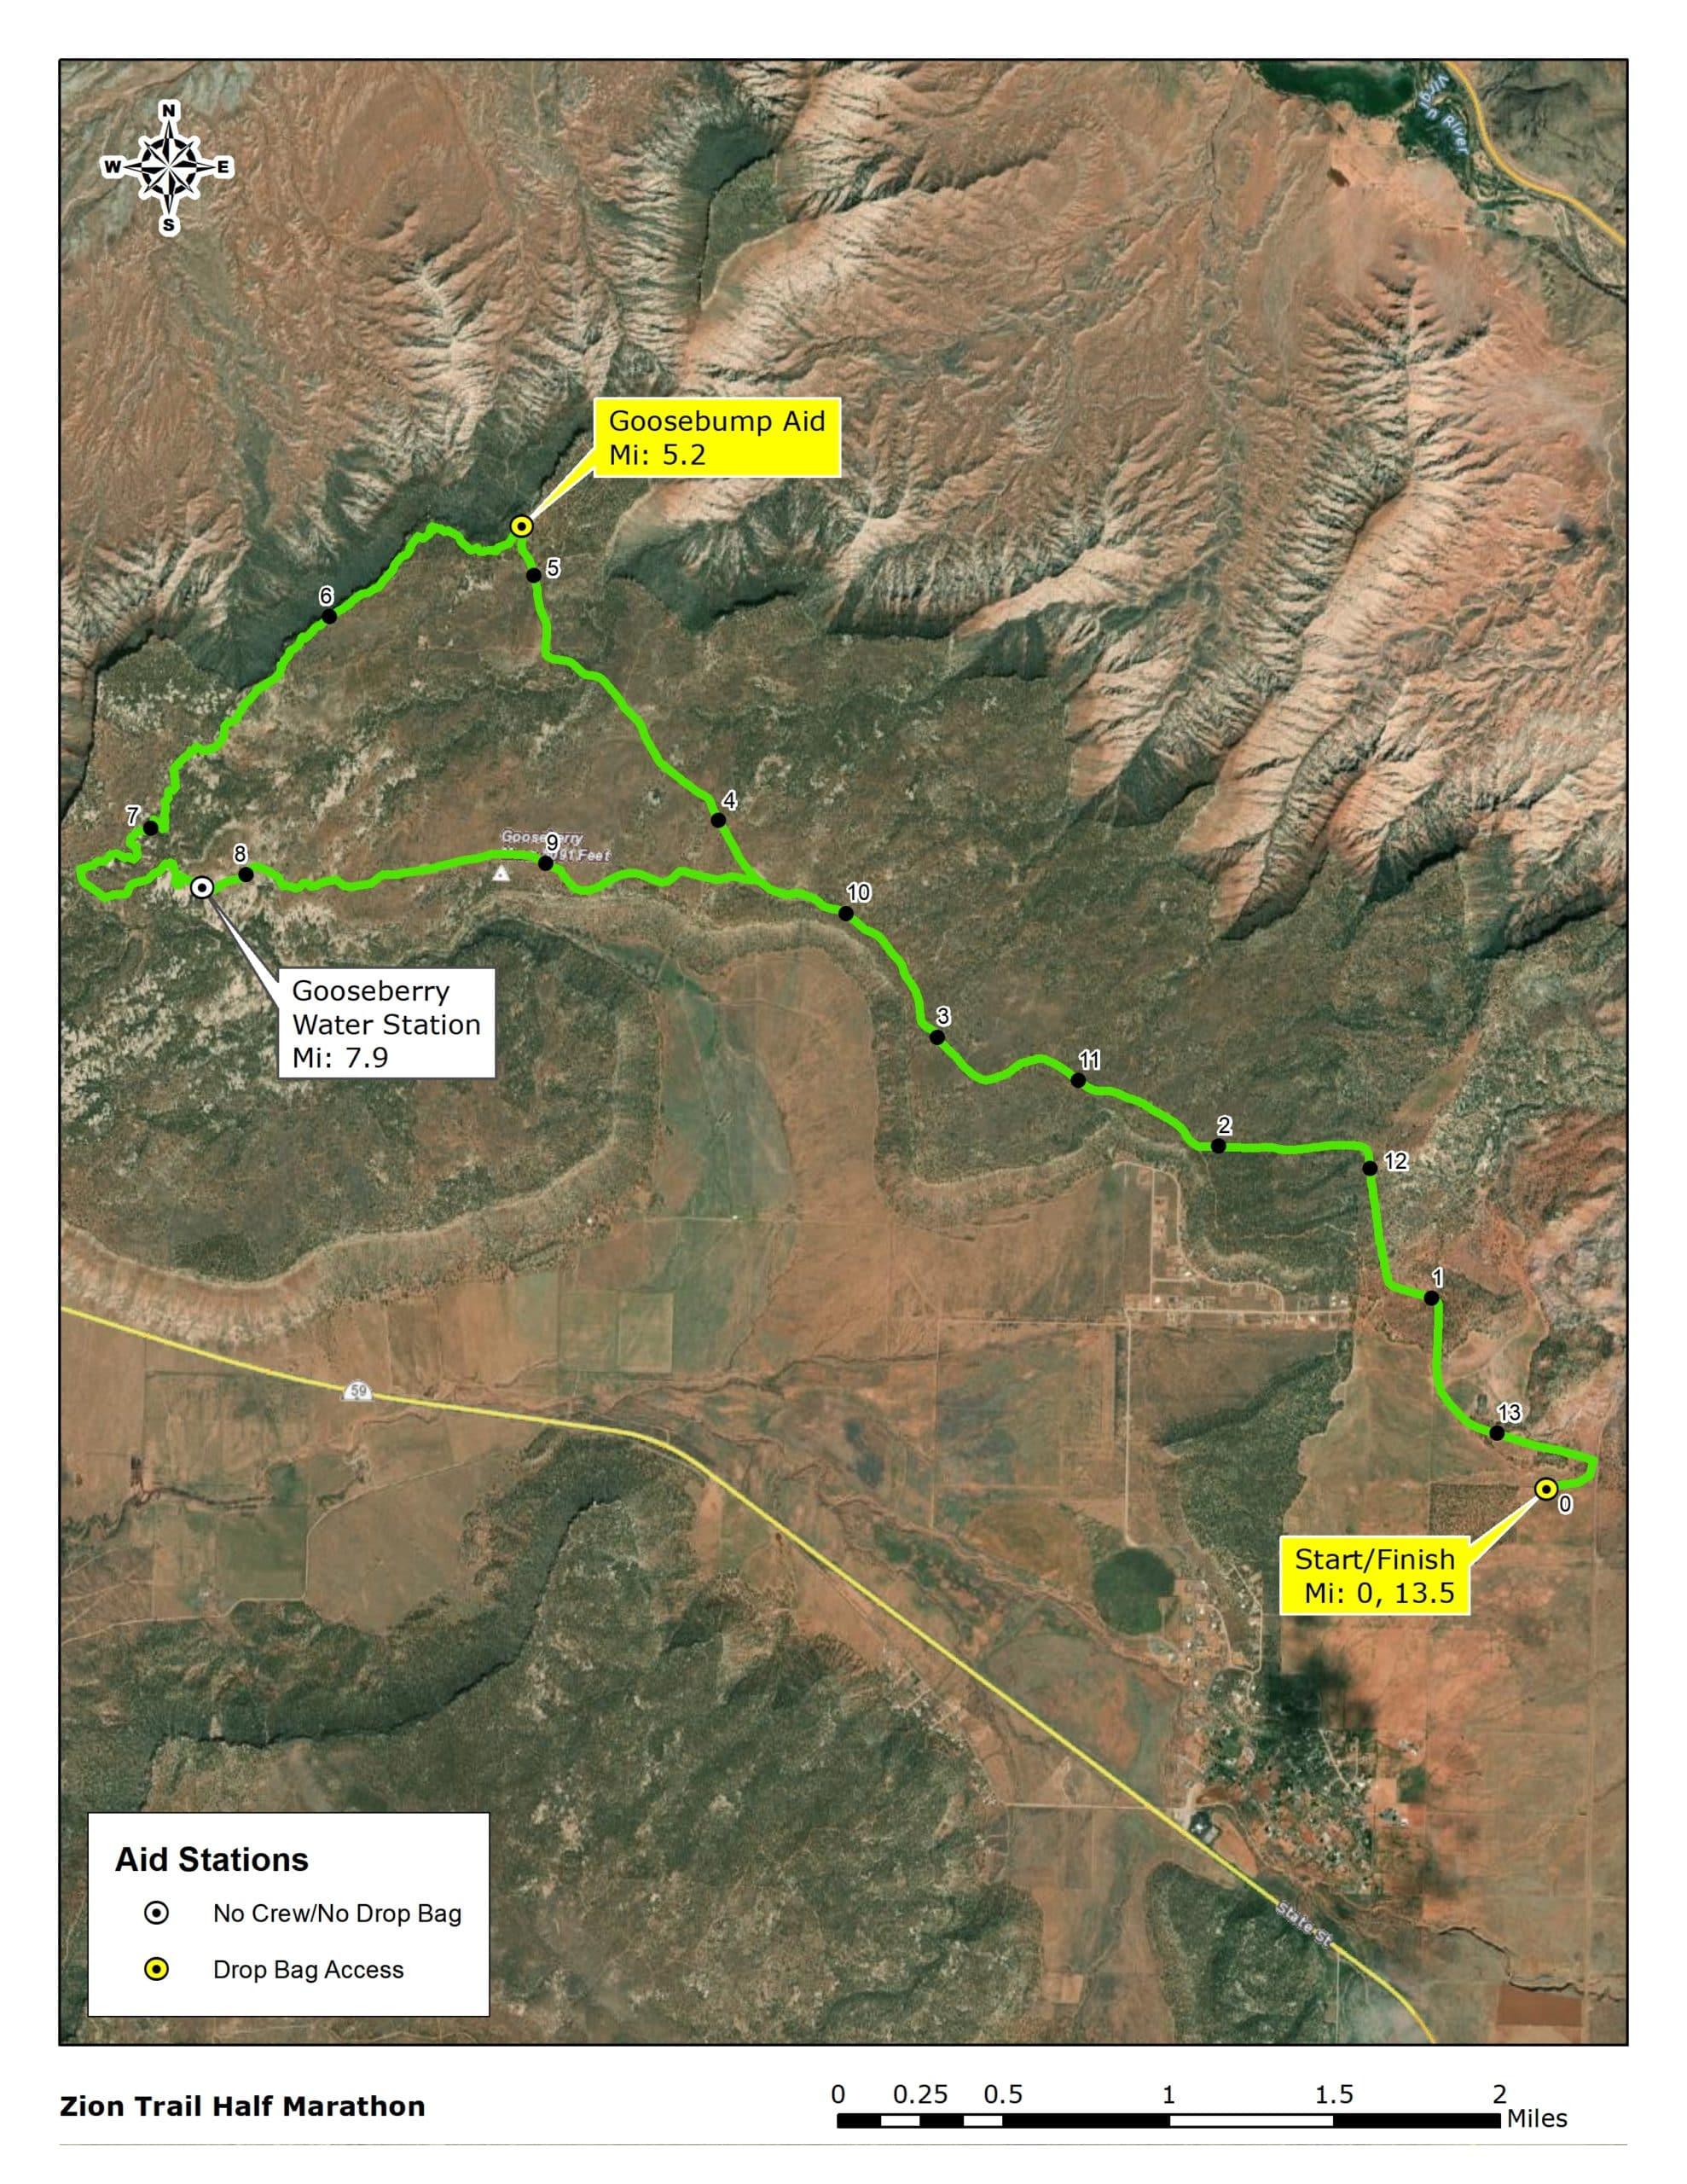 Course map of the Zion Ultras trail half marathon